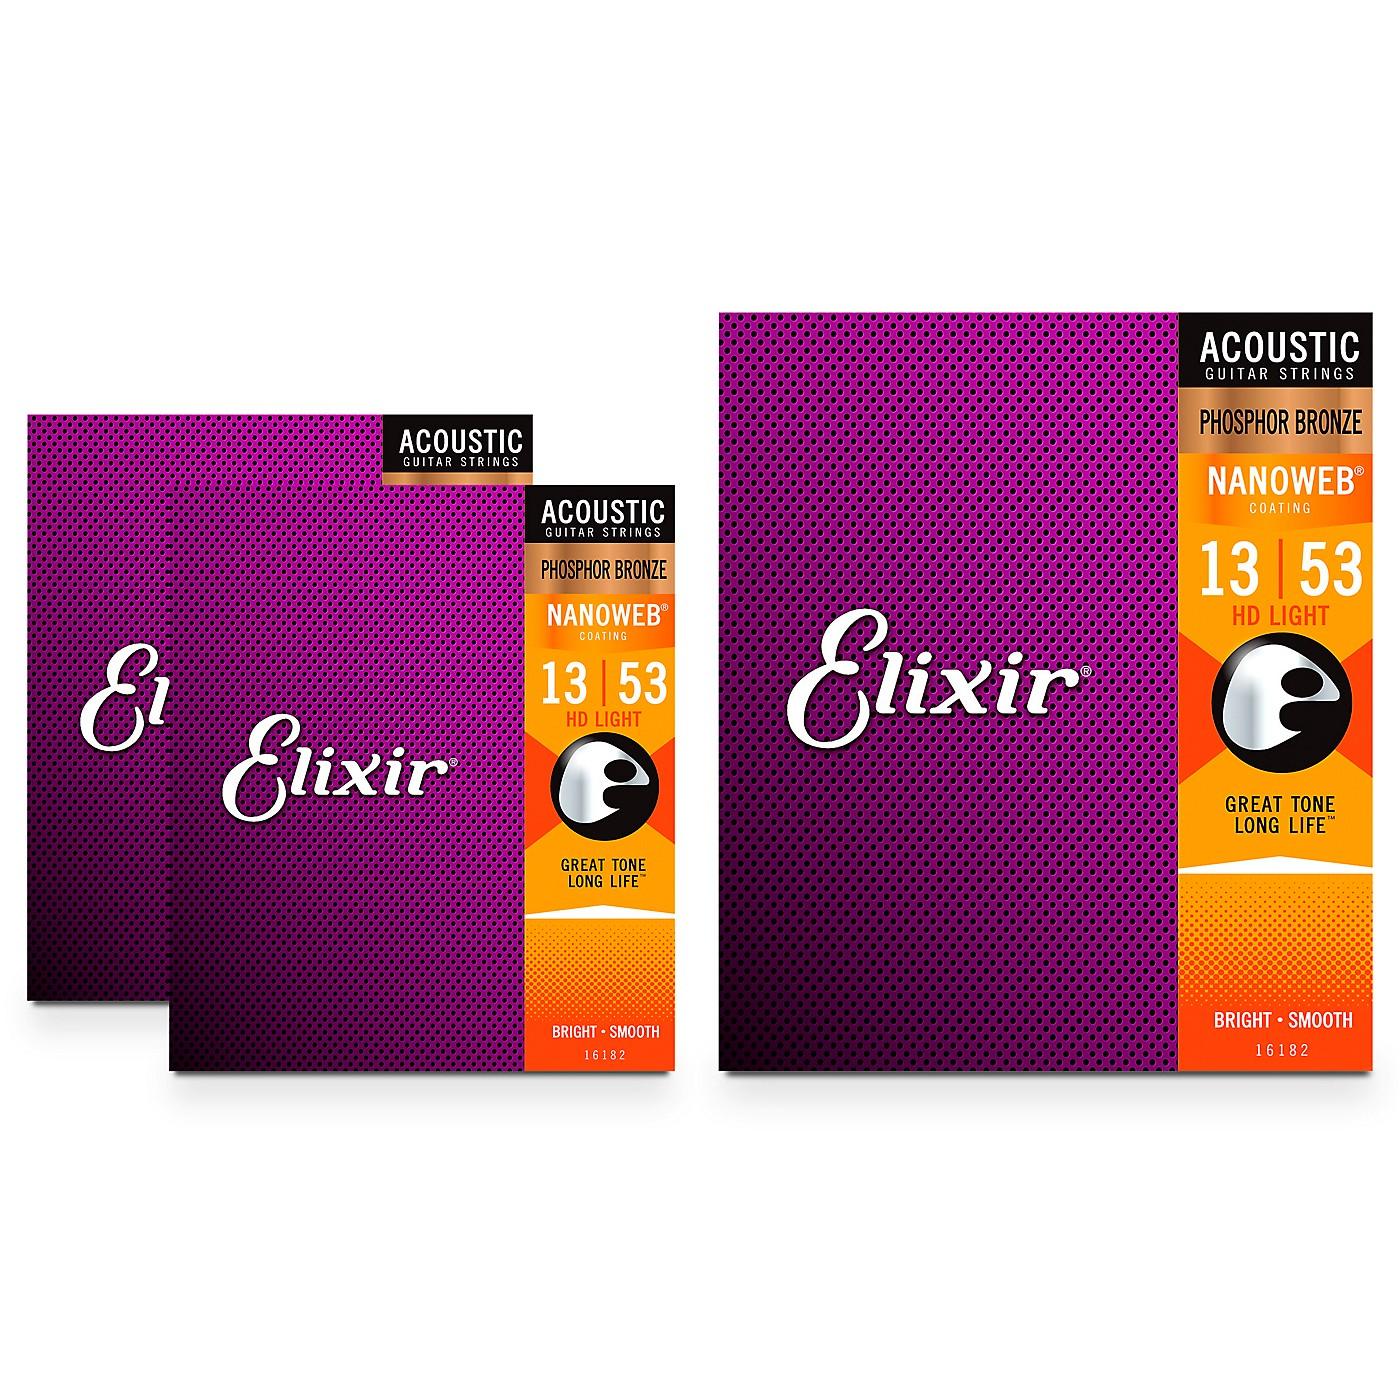 Elixir Nanoweb HD Light Phosphor Bronze Acoustic Guitar Strings 3 Pack thumbnail